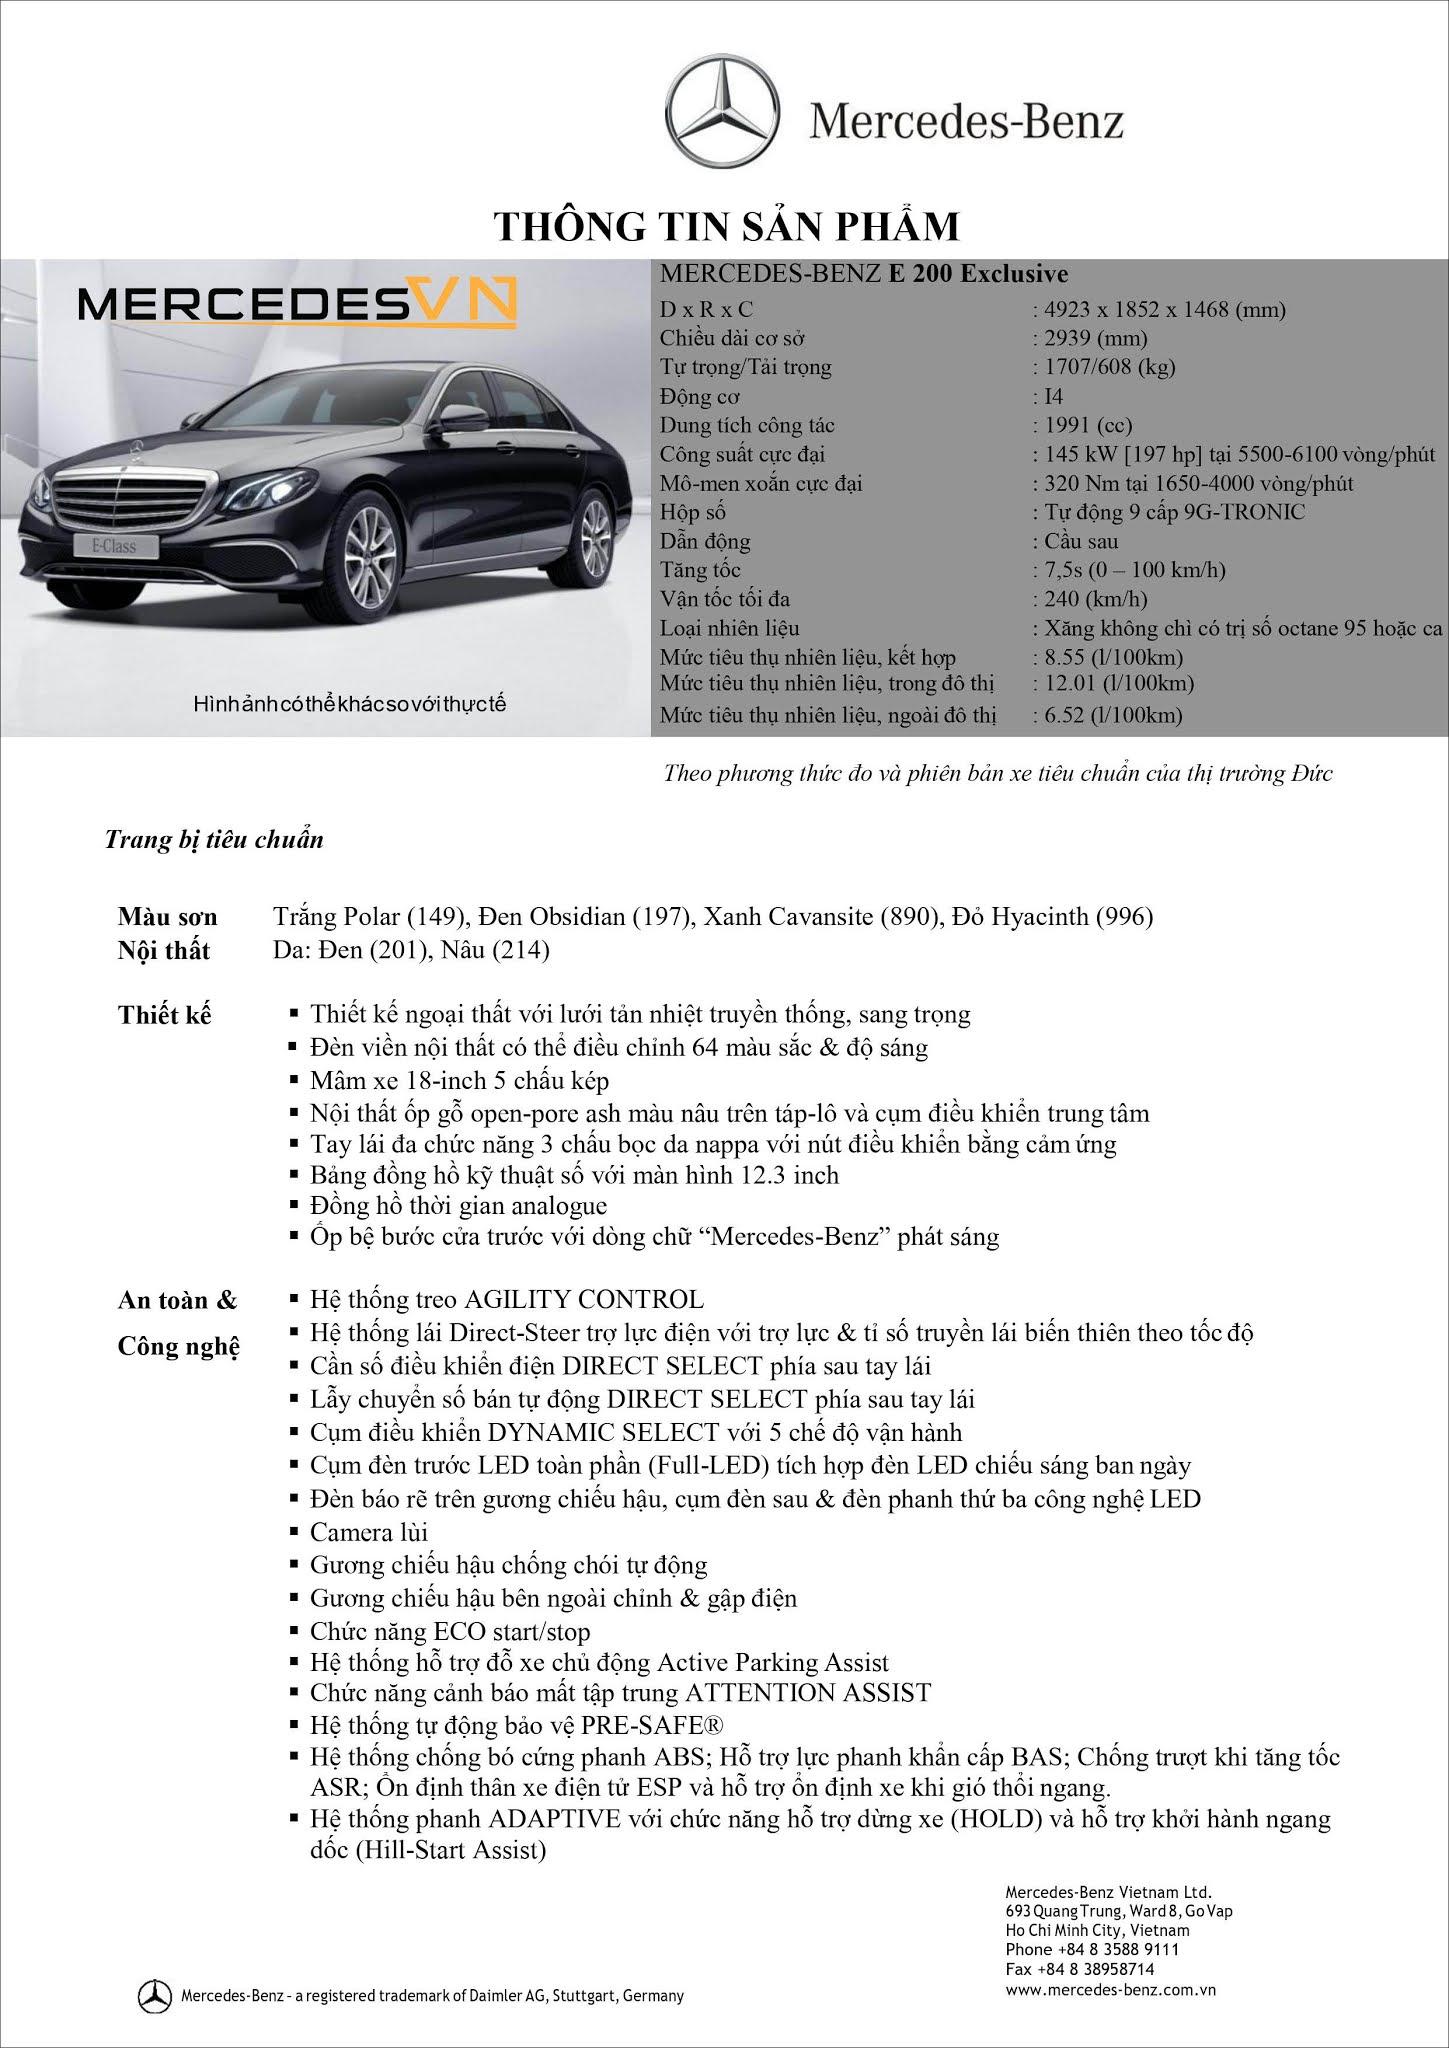 Bảng thông số kỹ thuật Mercedes E200 Exclusive 2021